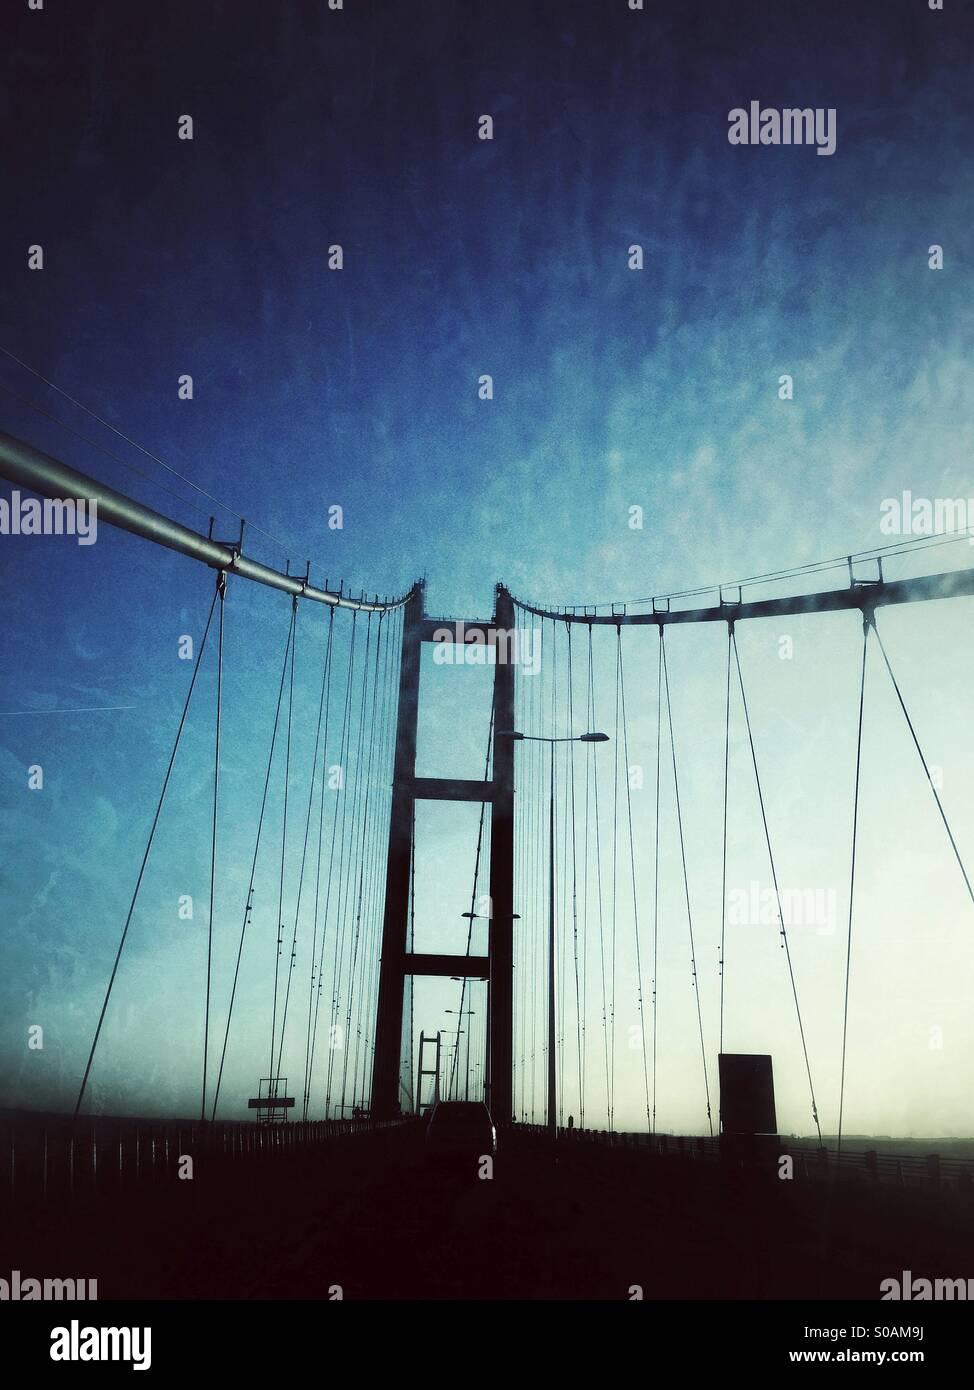 Humber Bridge single span suspension bridge at twilight, England UK - Stock Image